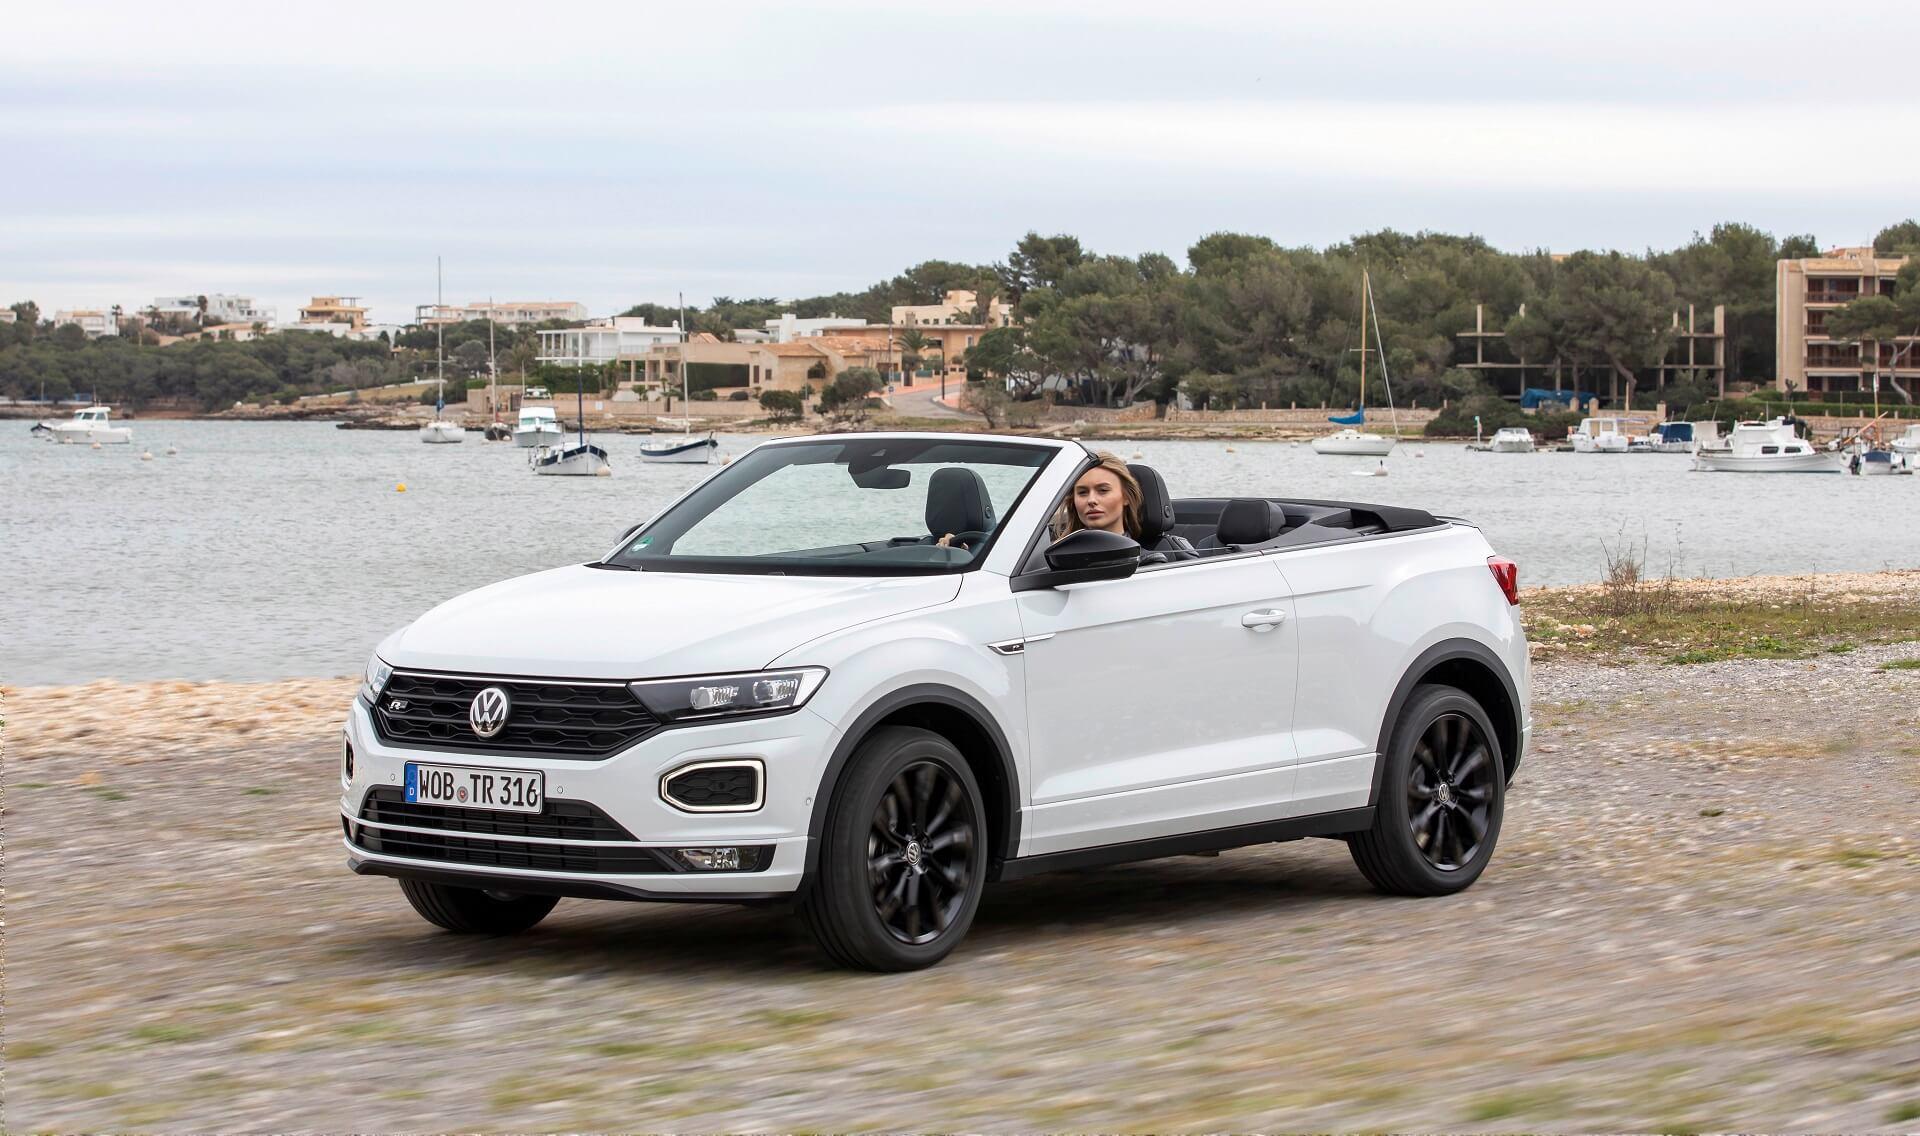 Volkswagen T-Roc Cabriolet - Δύο εκδόσεις - Πλούσιος βασικός εξοπλισμός